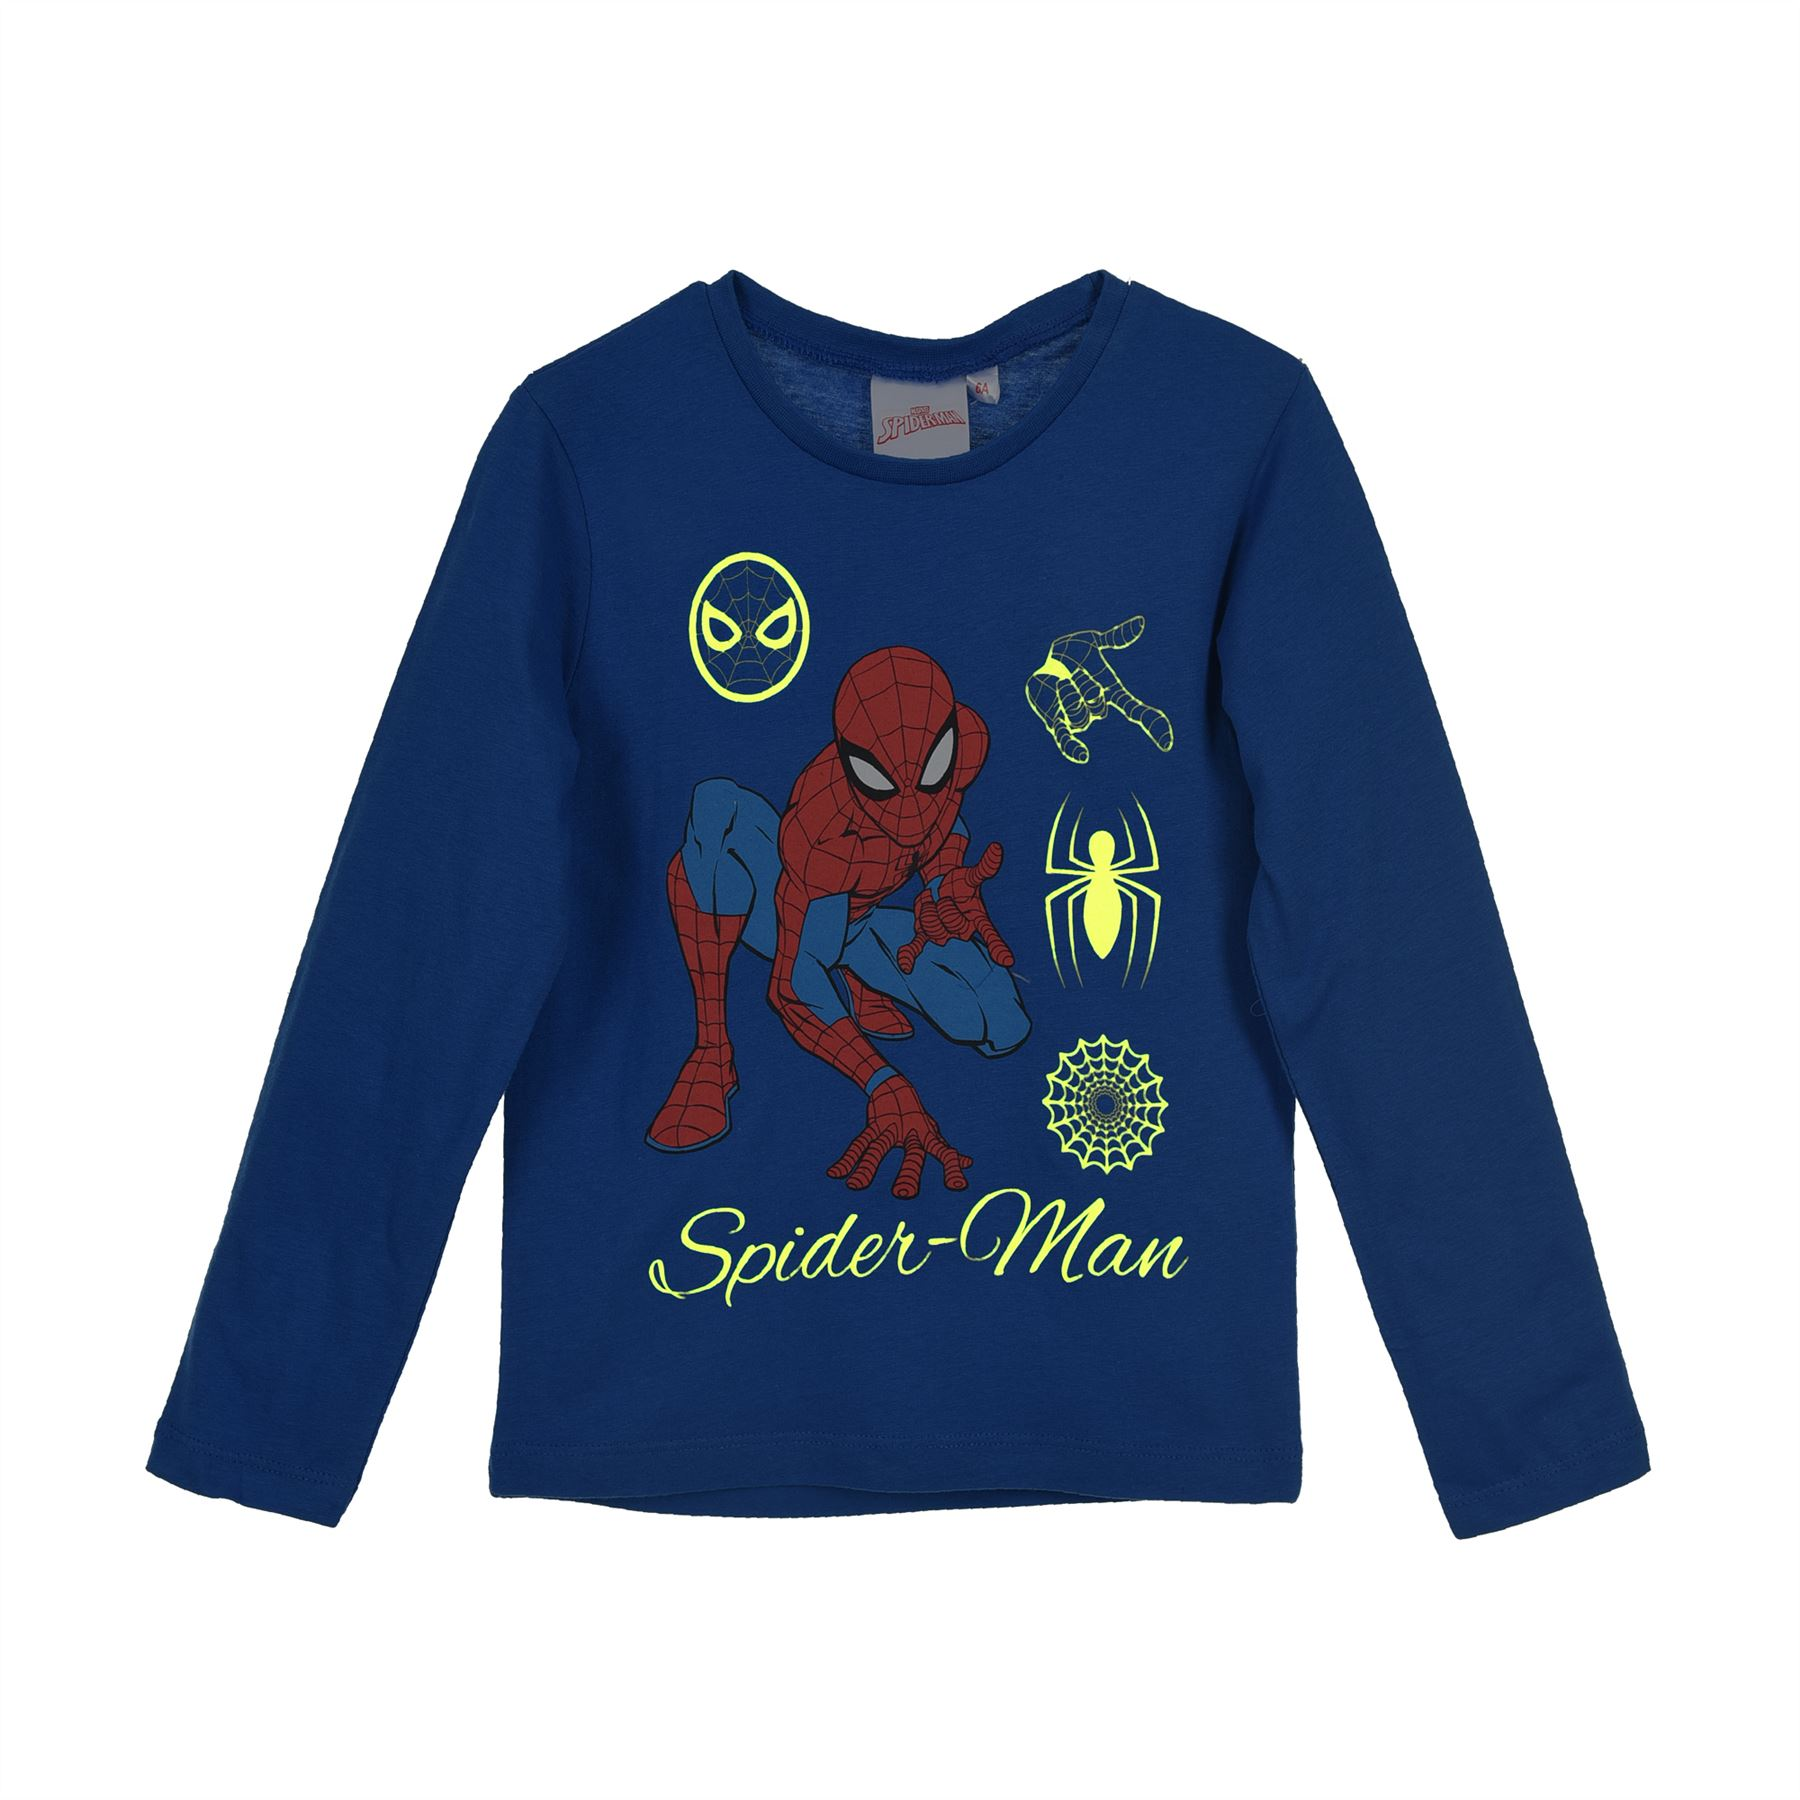 Boys SPIDERMAN T SHIRT LONG Sleeve T Shirt Age 3 YEARS NEW